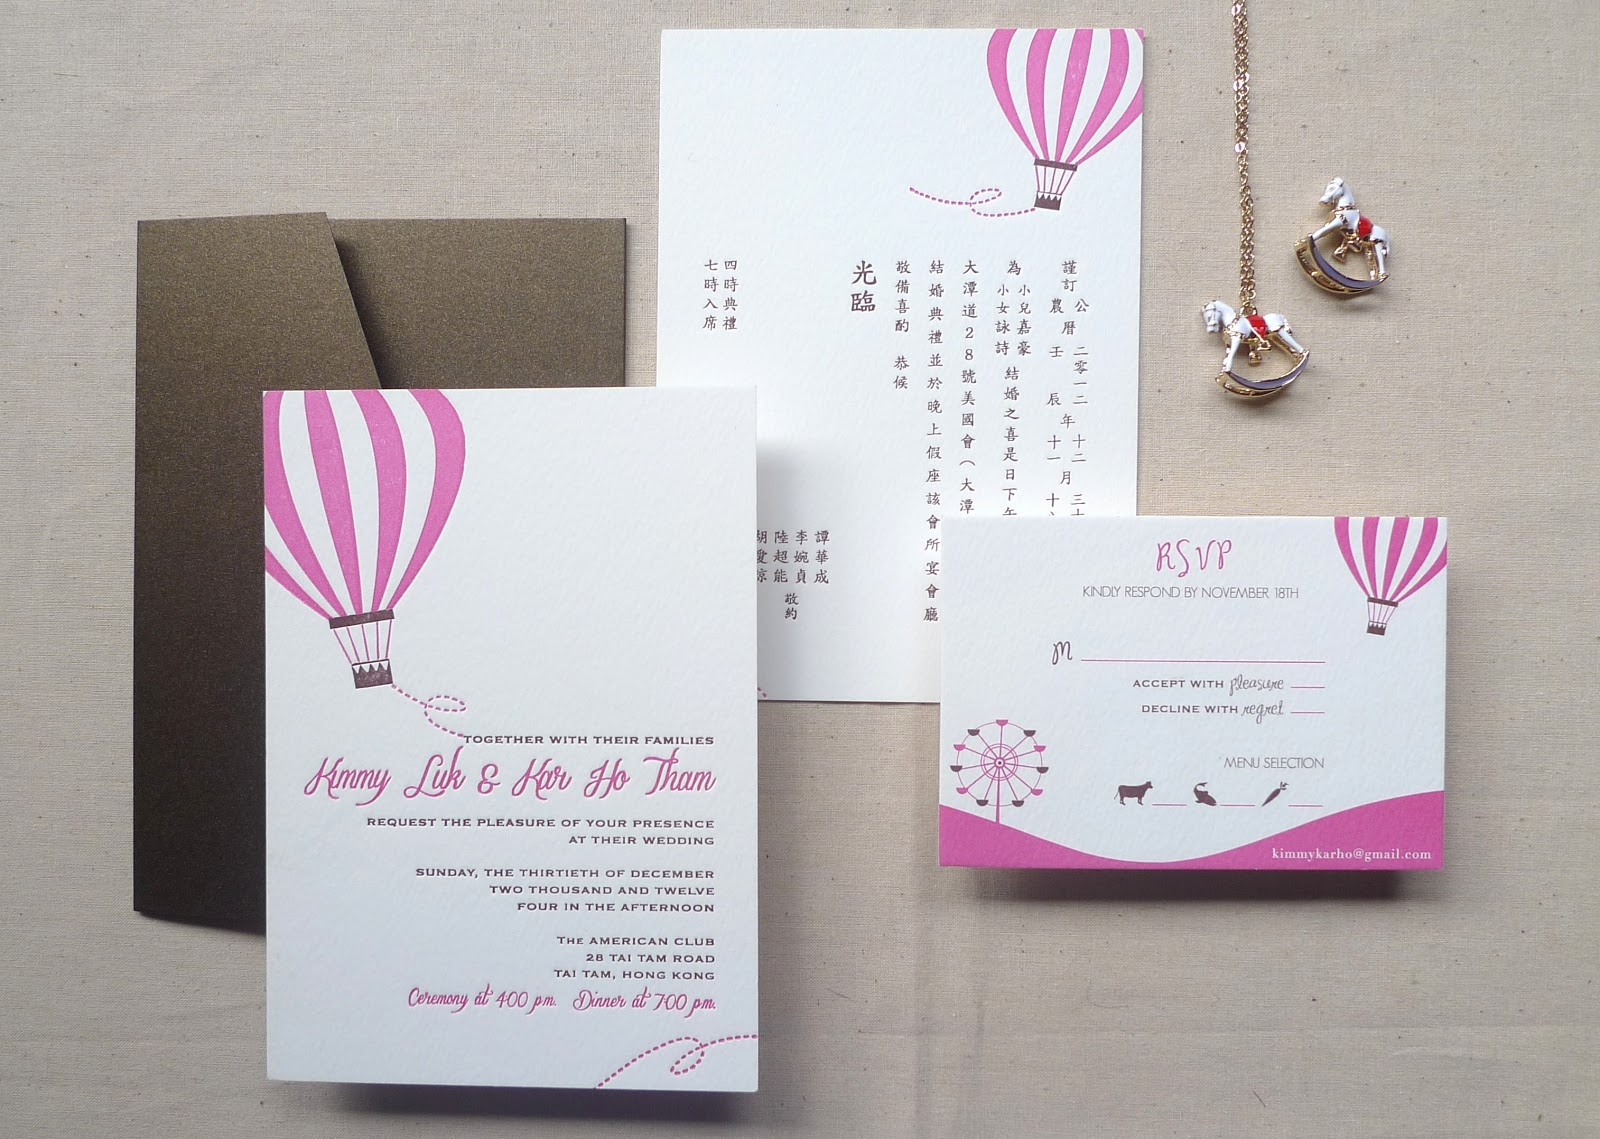 Kalo Make Art Bespoke Wedding Invitation Designs Fly With